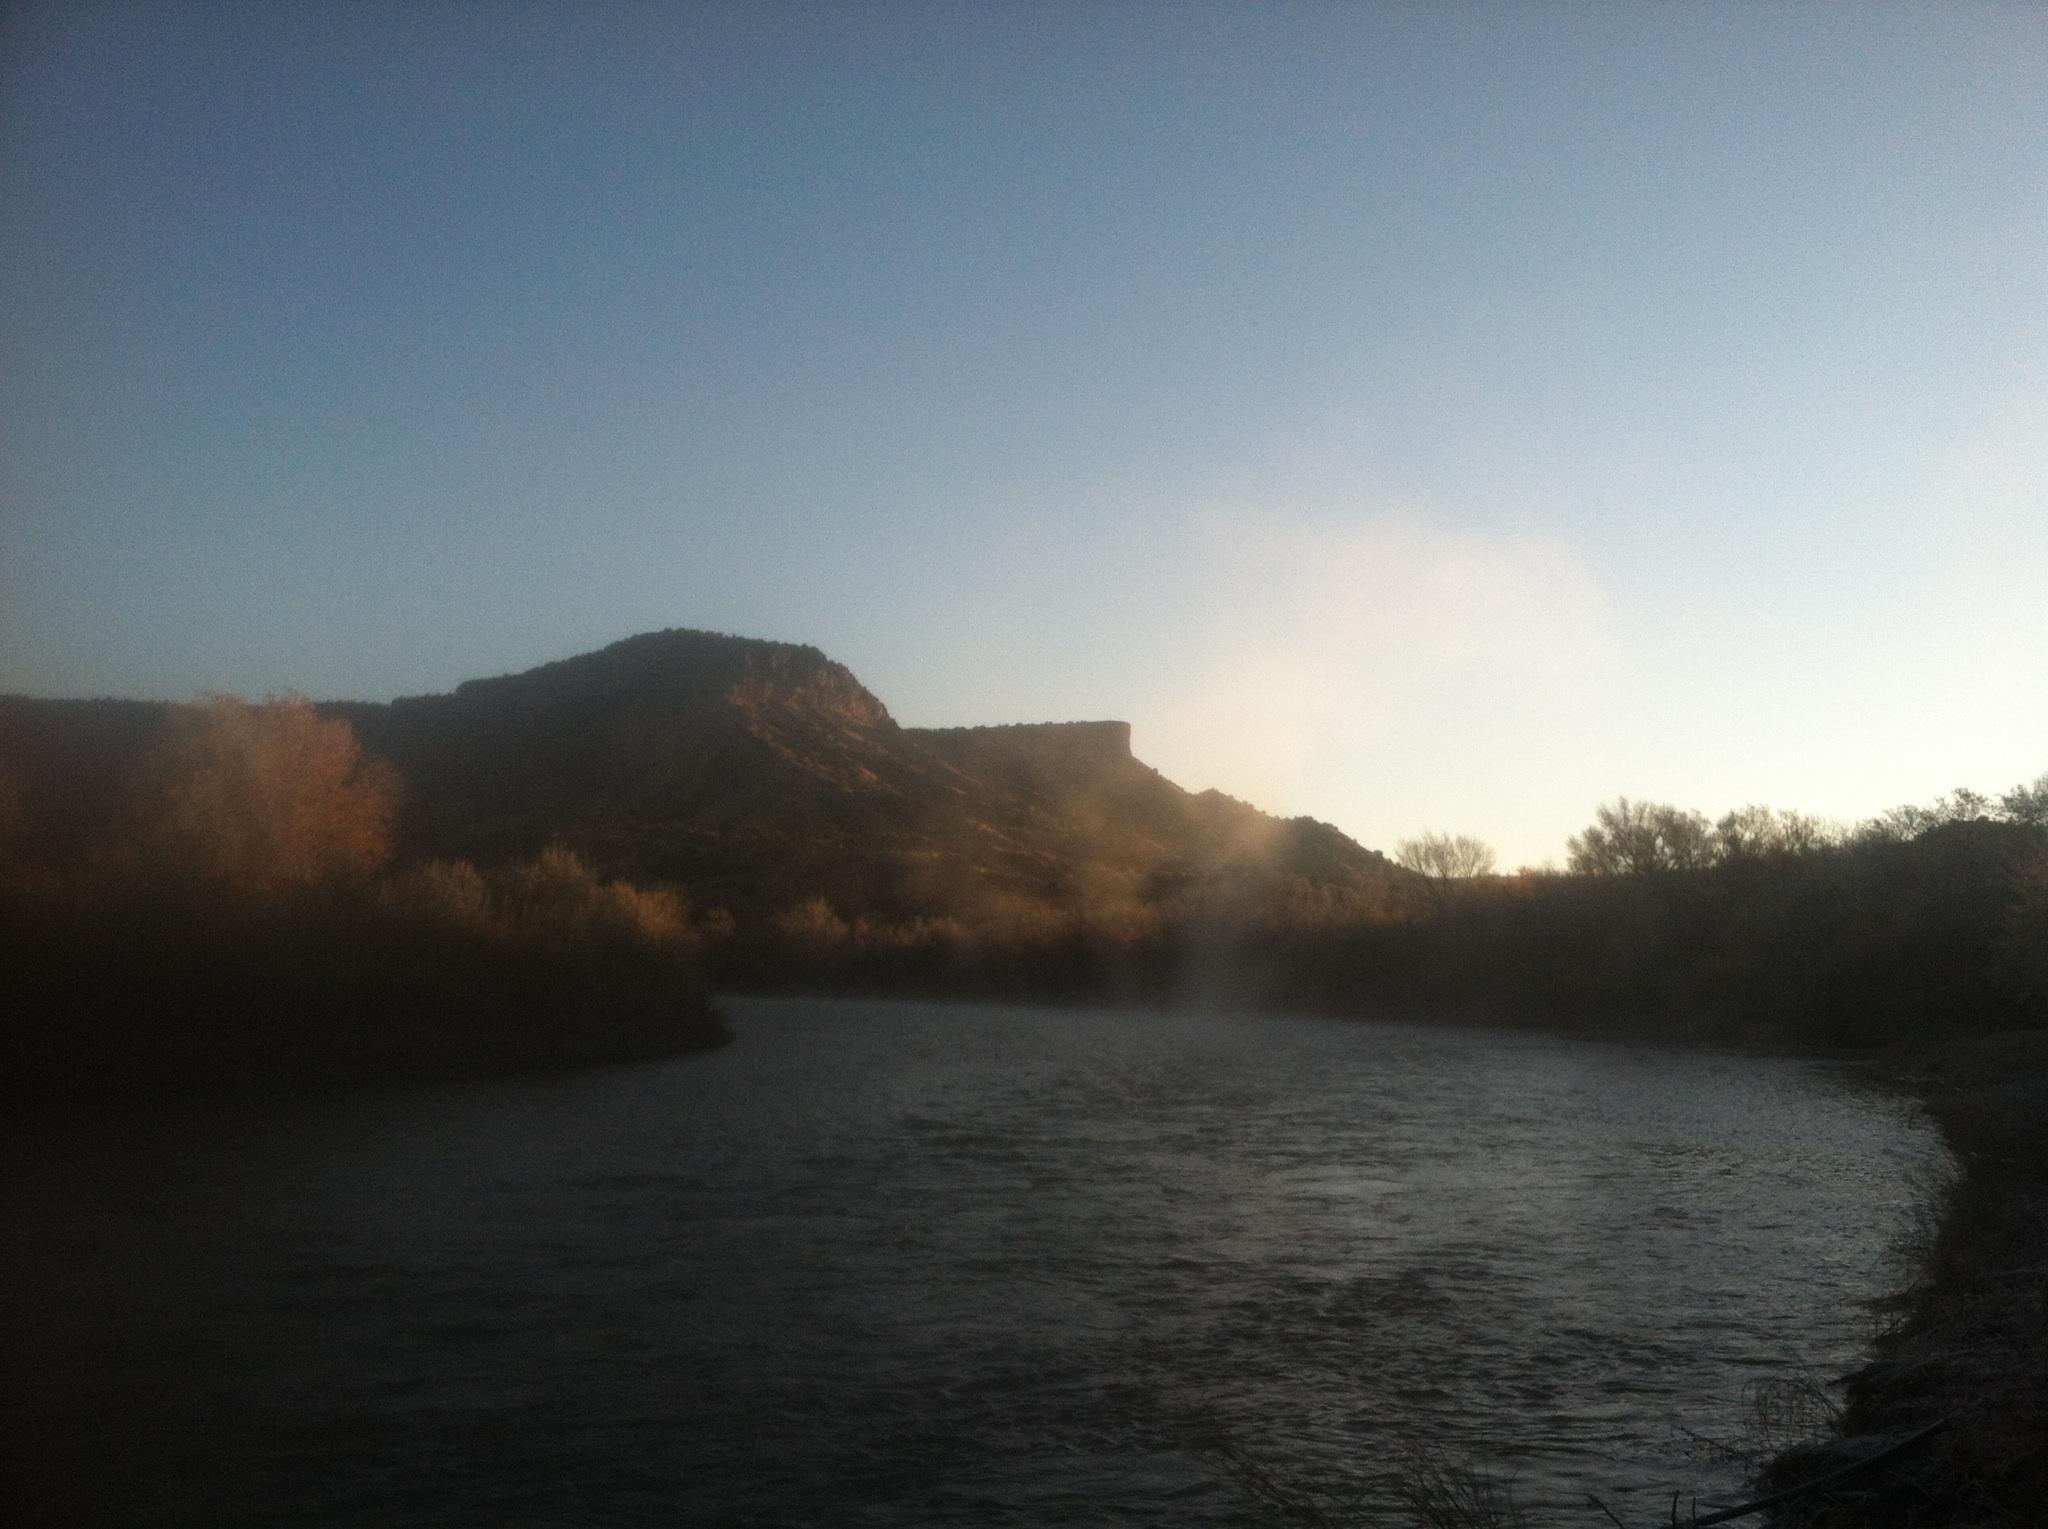 Rio Diversion morning fog mist